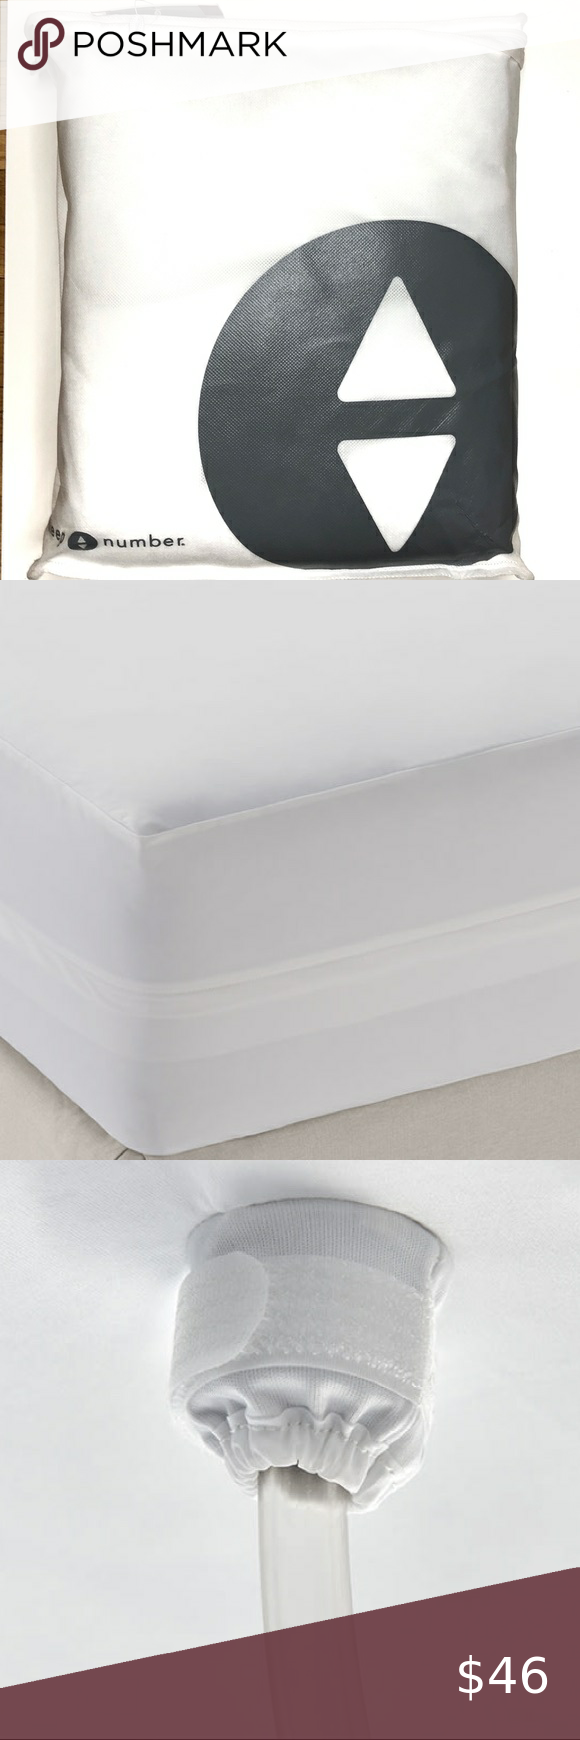 Sleep Number Total Encasement mattress cover 360 in 2020